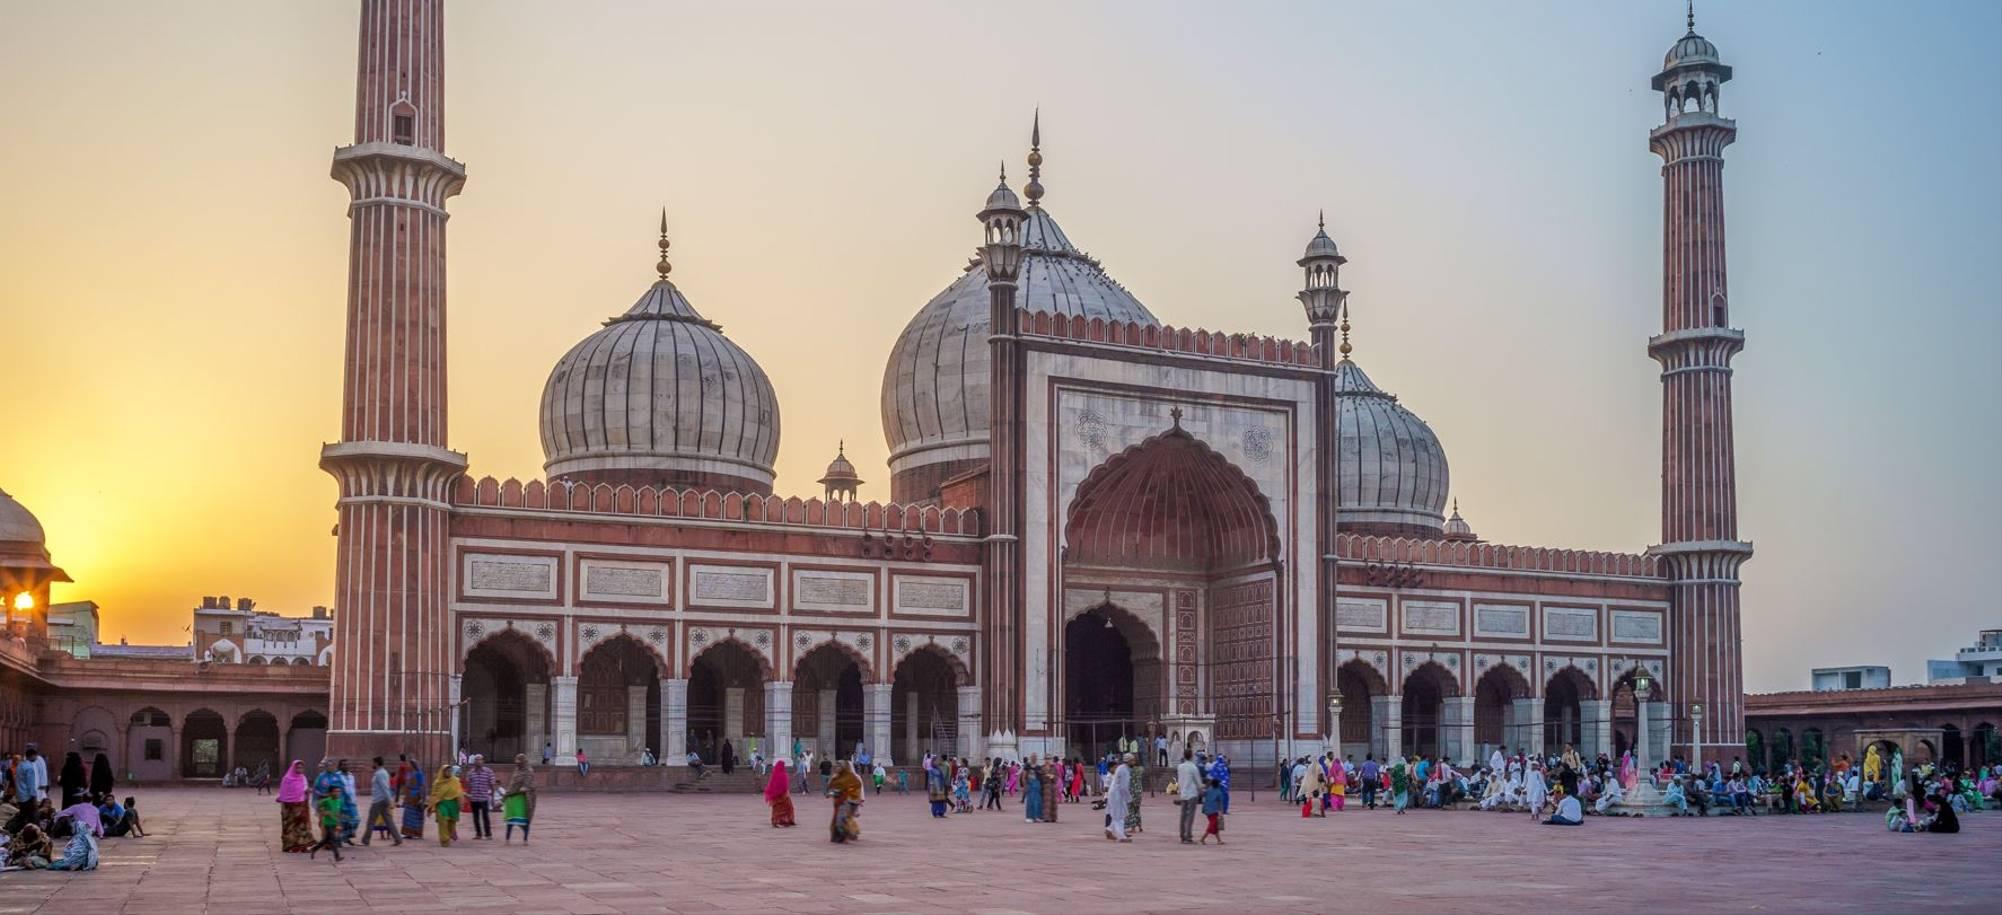 23 Day - Delhi, Jama Masjid - Itinerary Desktop.jpg